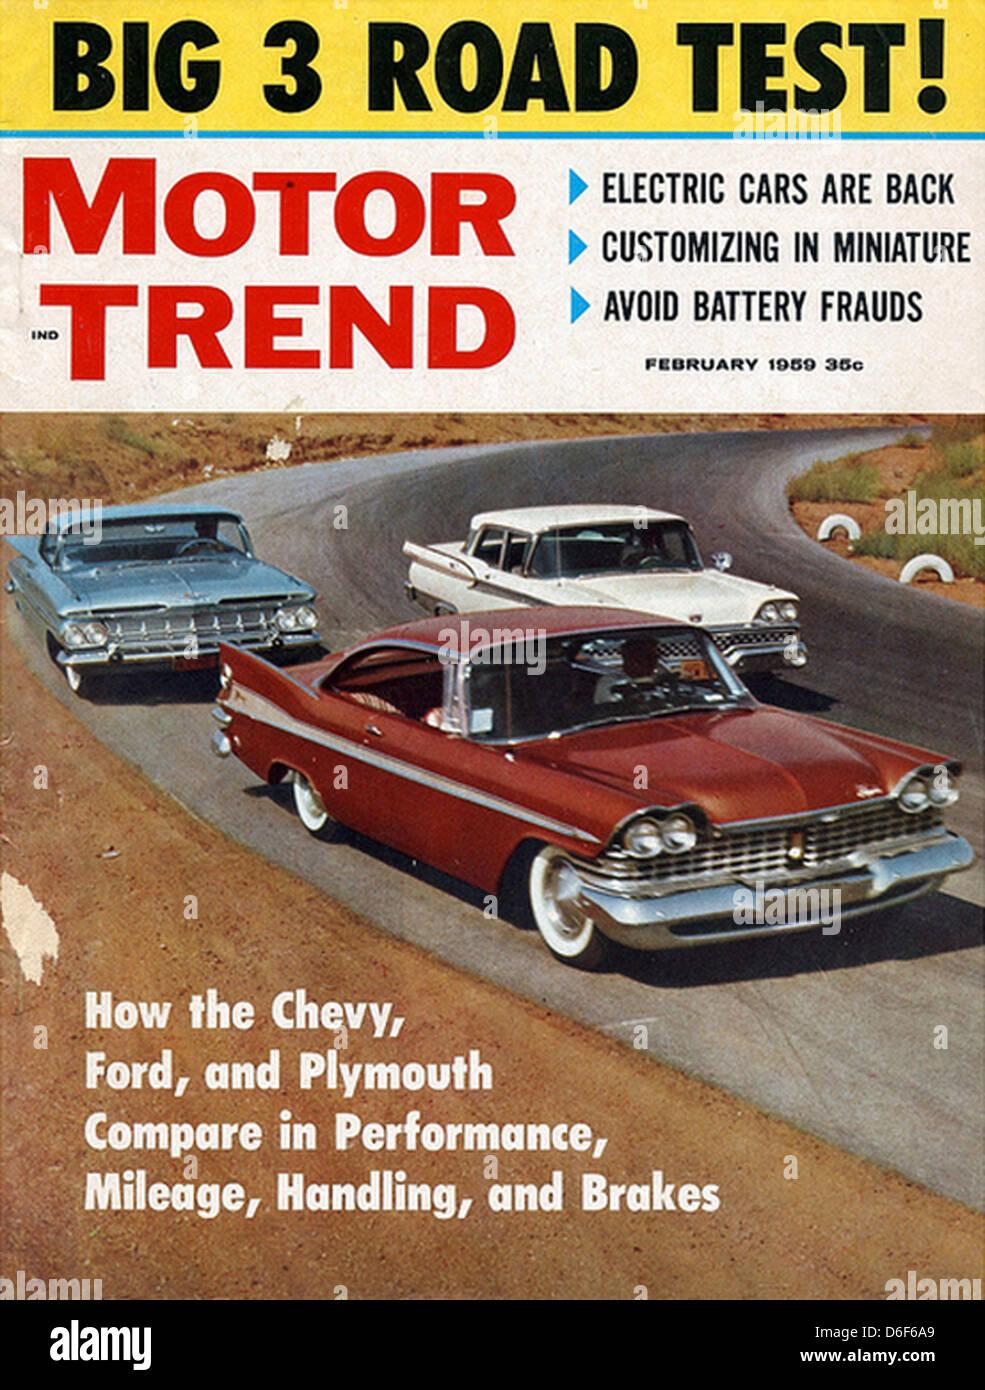 MOTOR TREND US car magazine issue February 1959 Stock Photo ...